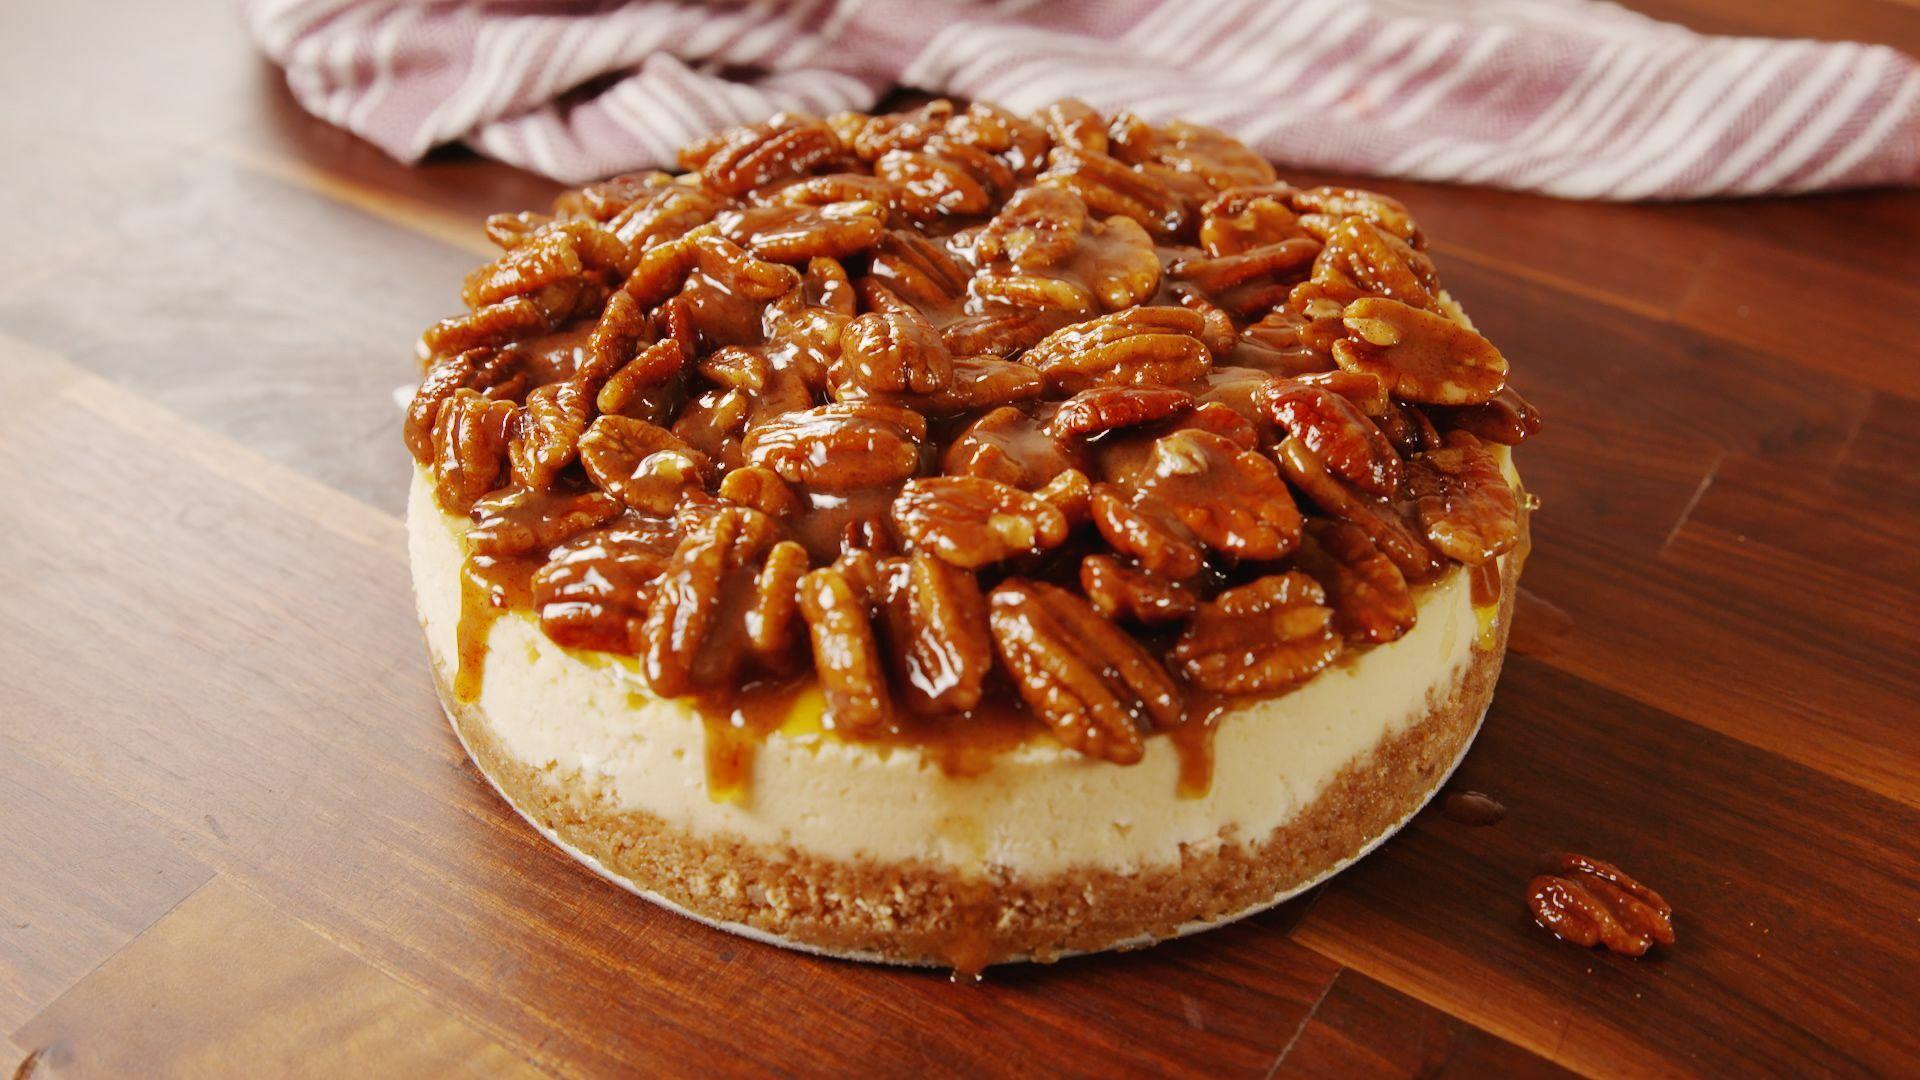 1510699995-delish-pecan-pie-cheesecake-still1.jpg